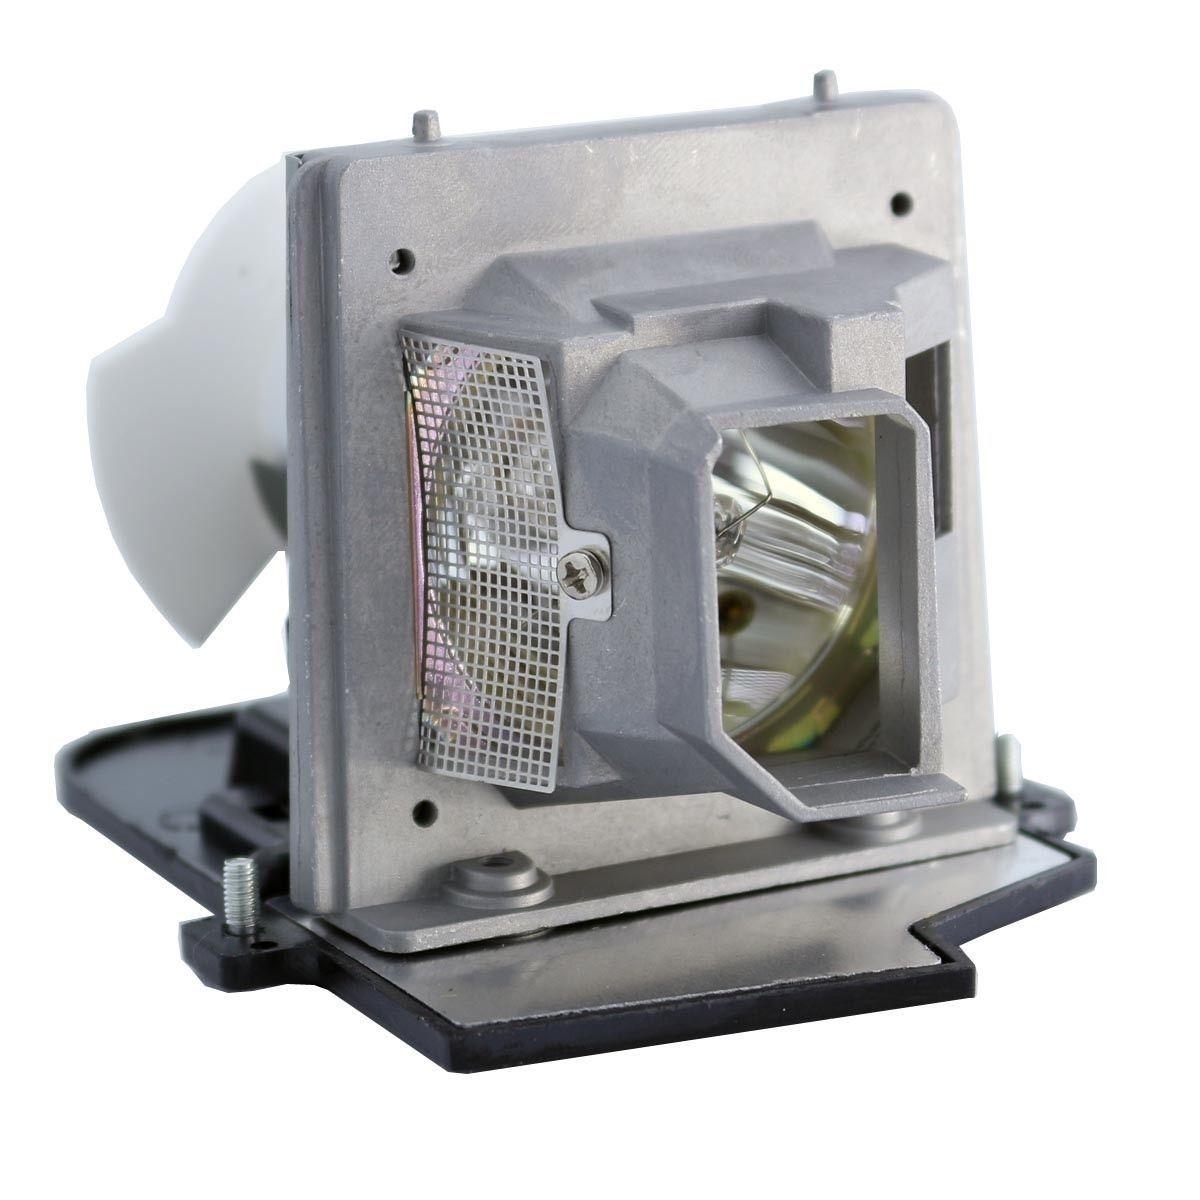 EC.J2101.001 for ACER XD1250P XD1270D PD100S PD100D PD100P PD100PD PD120 PD120D PD120P PD120PD XD1170D Projector Bulb Lamp free shipping original ec j2101 001 projector bare lamp for acer xd1270d pd100 pd100d pd100p pd100pd pd100s pd120